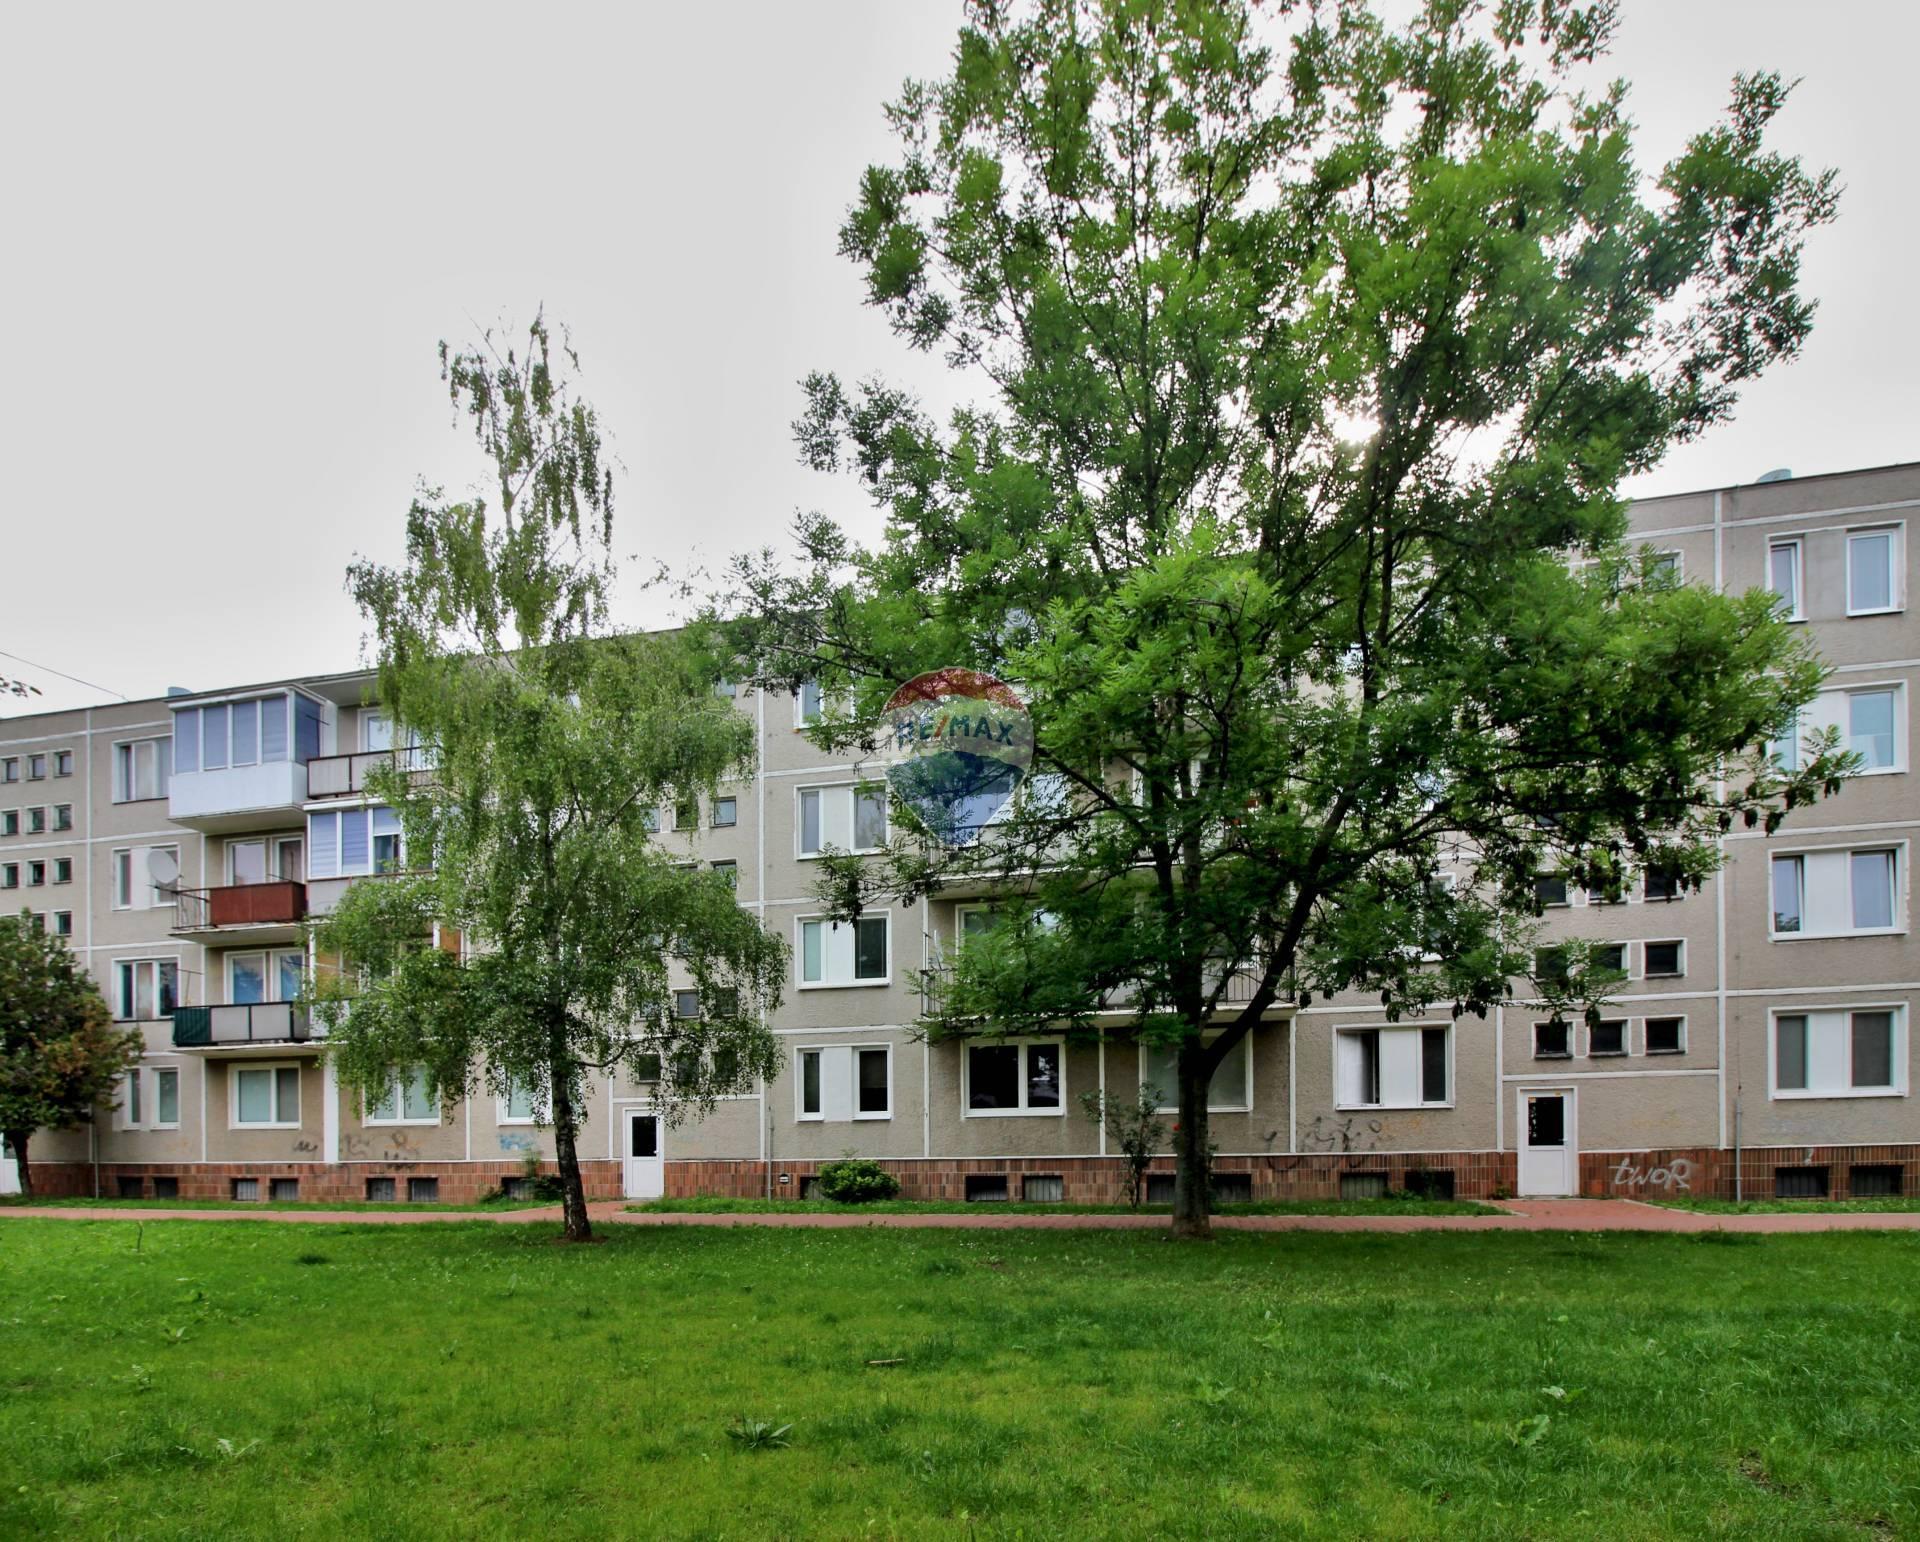 PREDAJ 1 izb.byt Dukelská ul., Nové Mesto nad Váhom